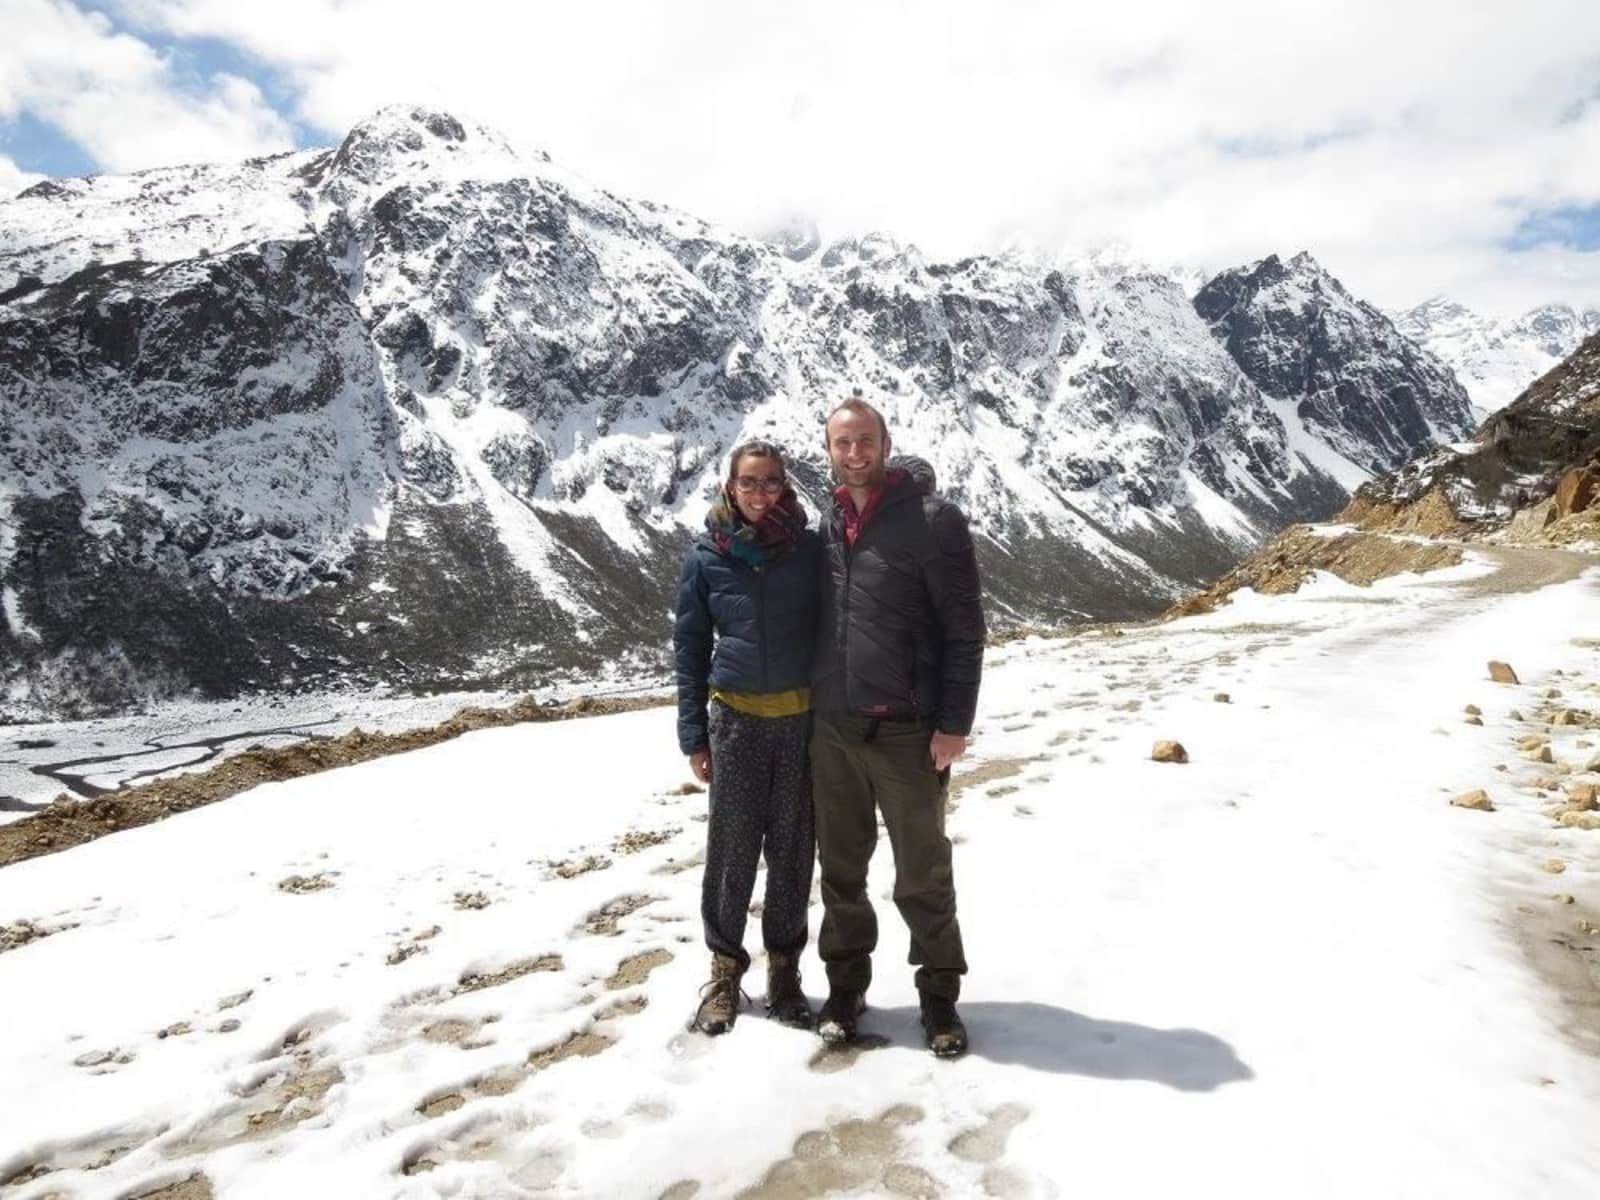 Anna & Thomas from Salford, United Kingdom